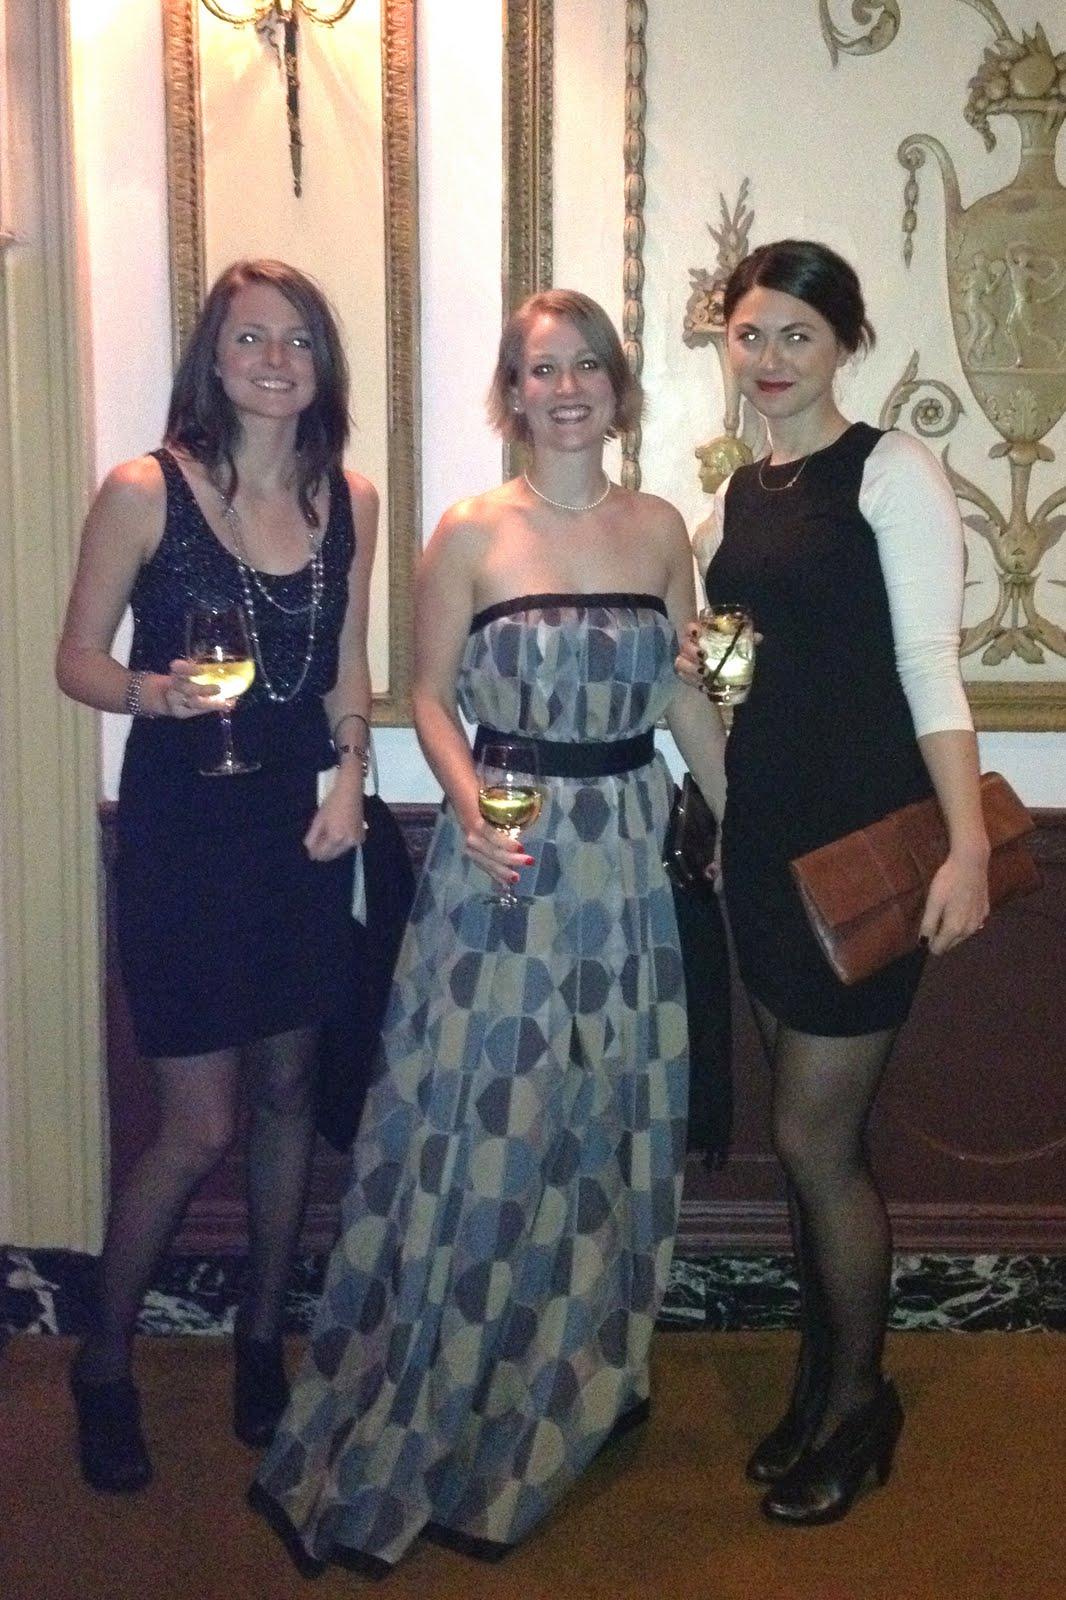 Mancini DuffyTSC Designers Amanda Colonna Heather L Groff And Kristi Bernick